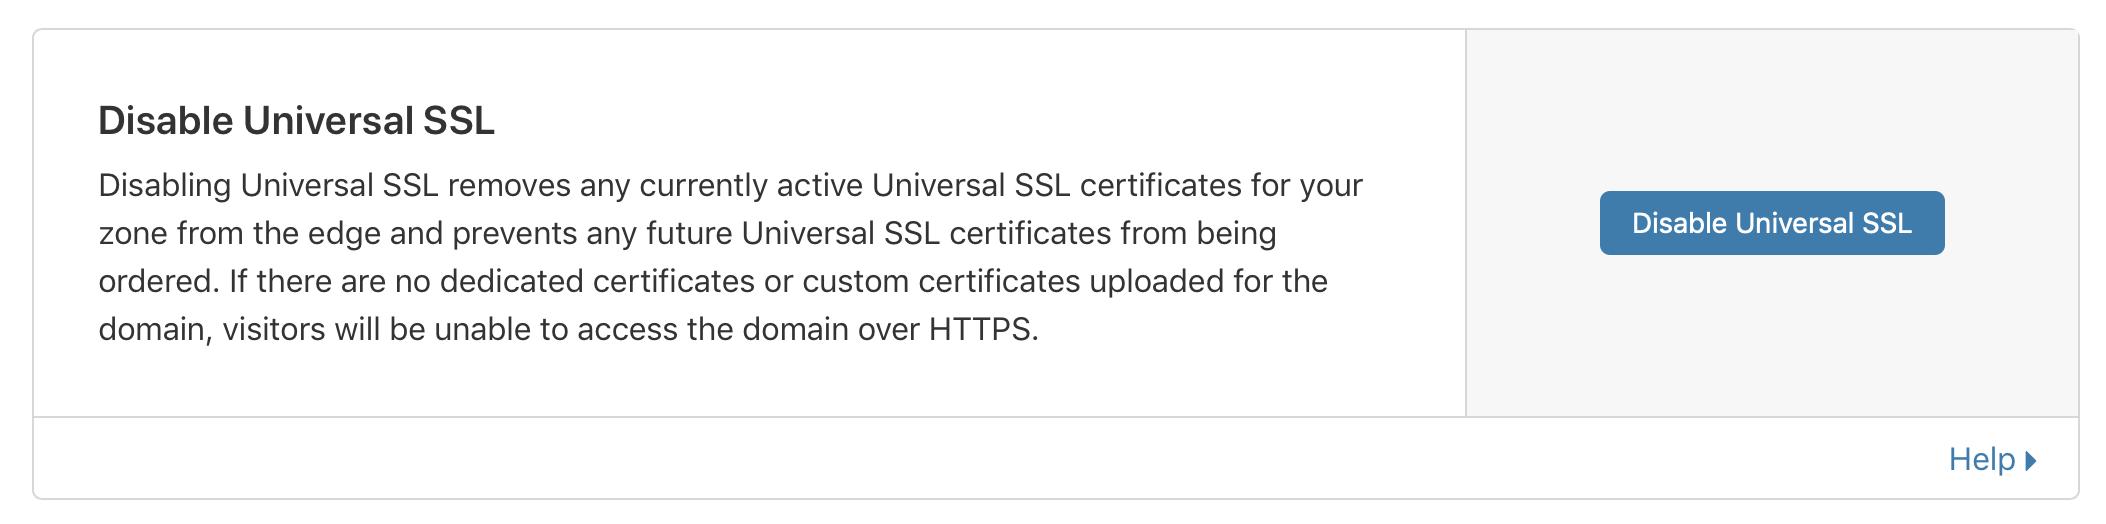 kích hoạt lại universal ssl để sửa lỗi ERR_SSL_VERSION_OR_CIPHER_MISMATCH